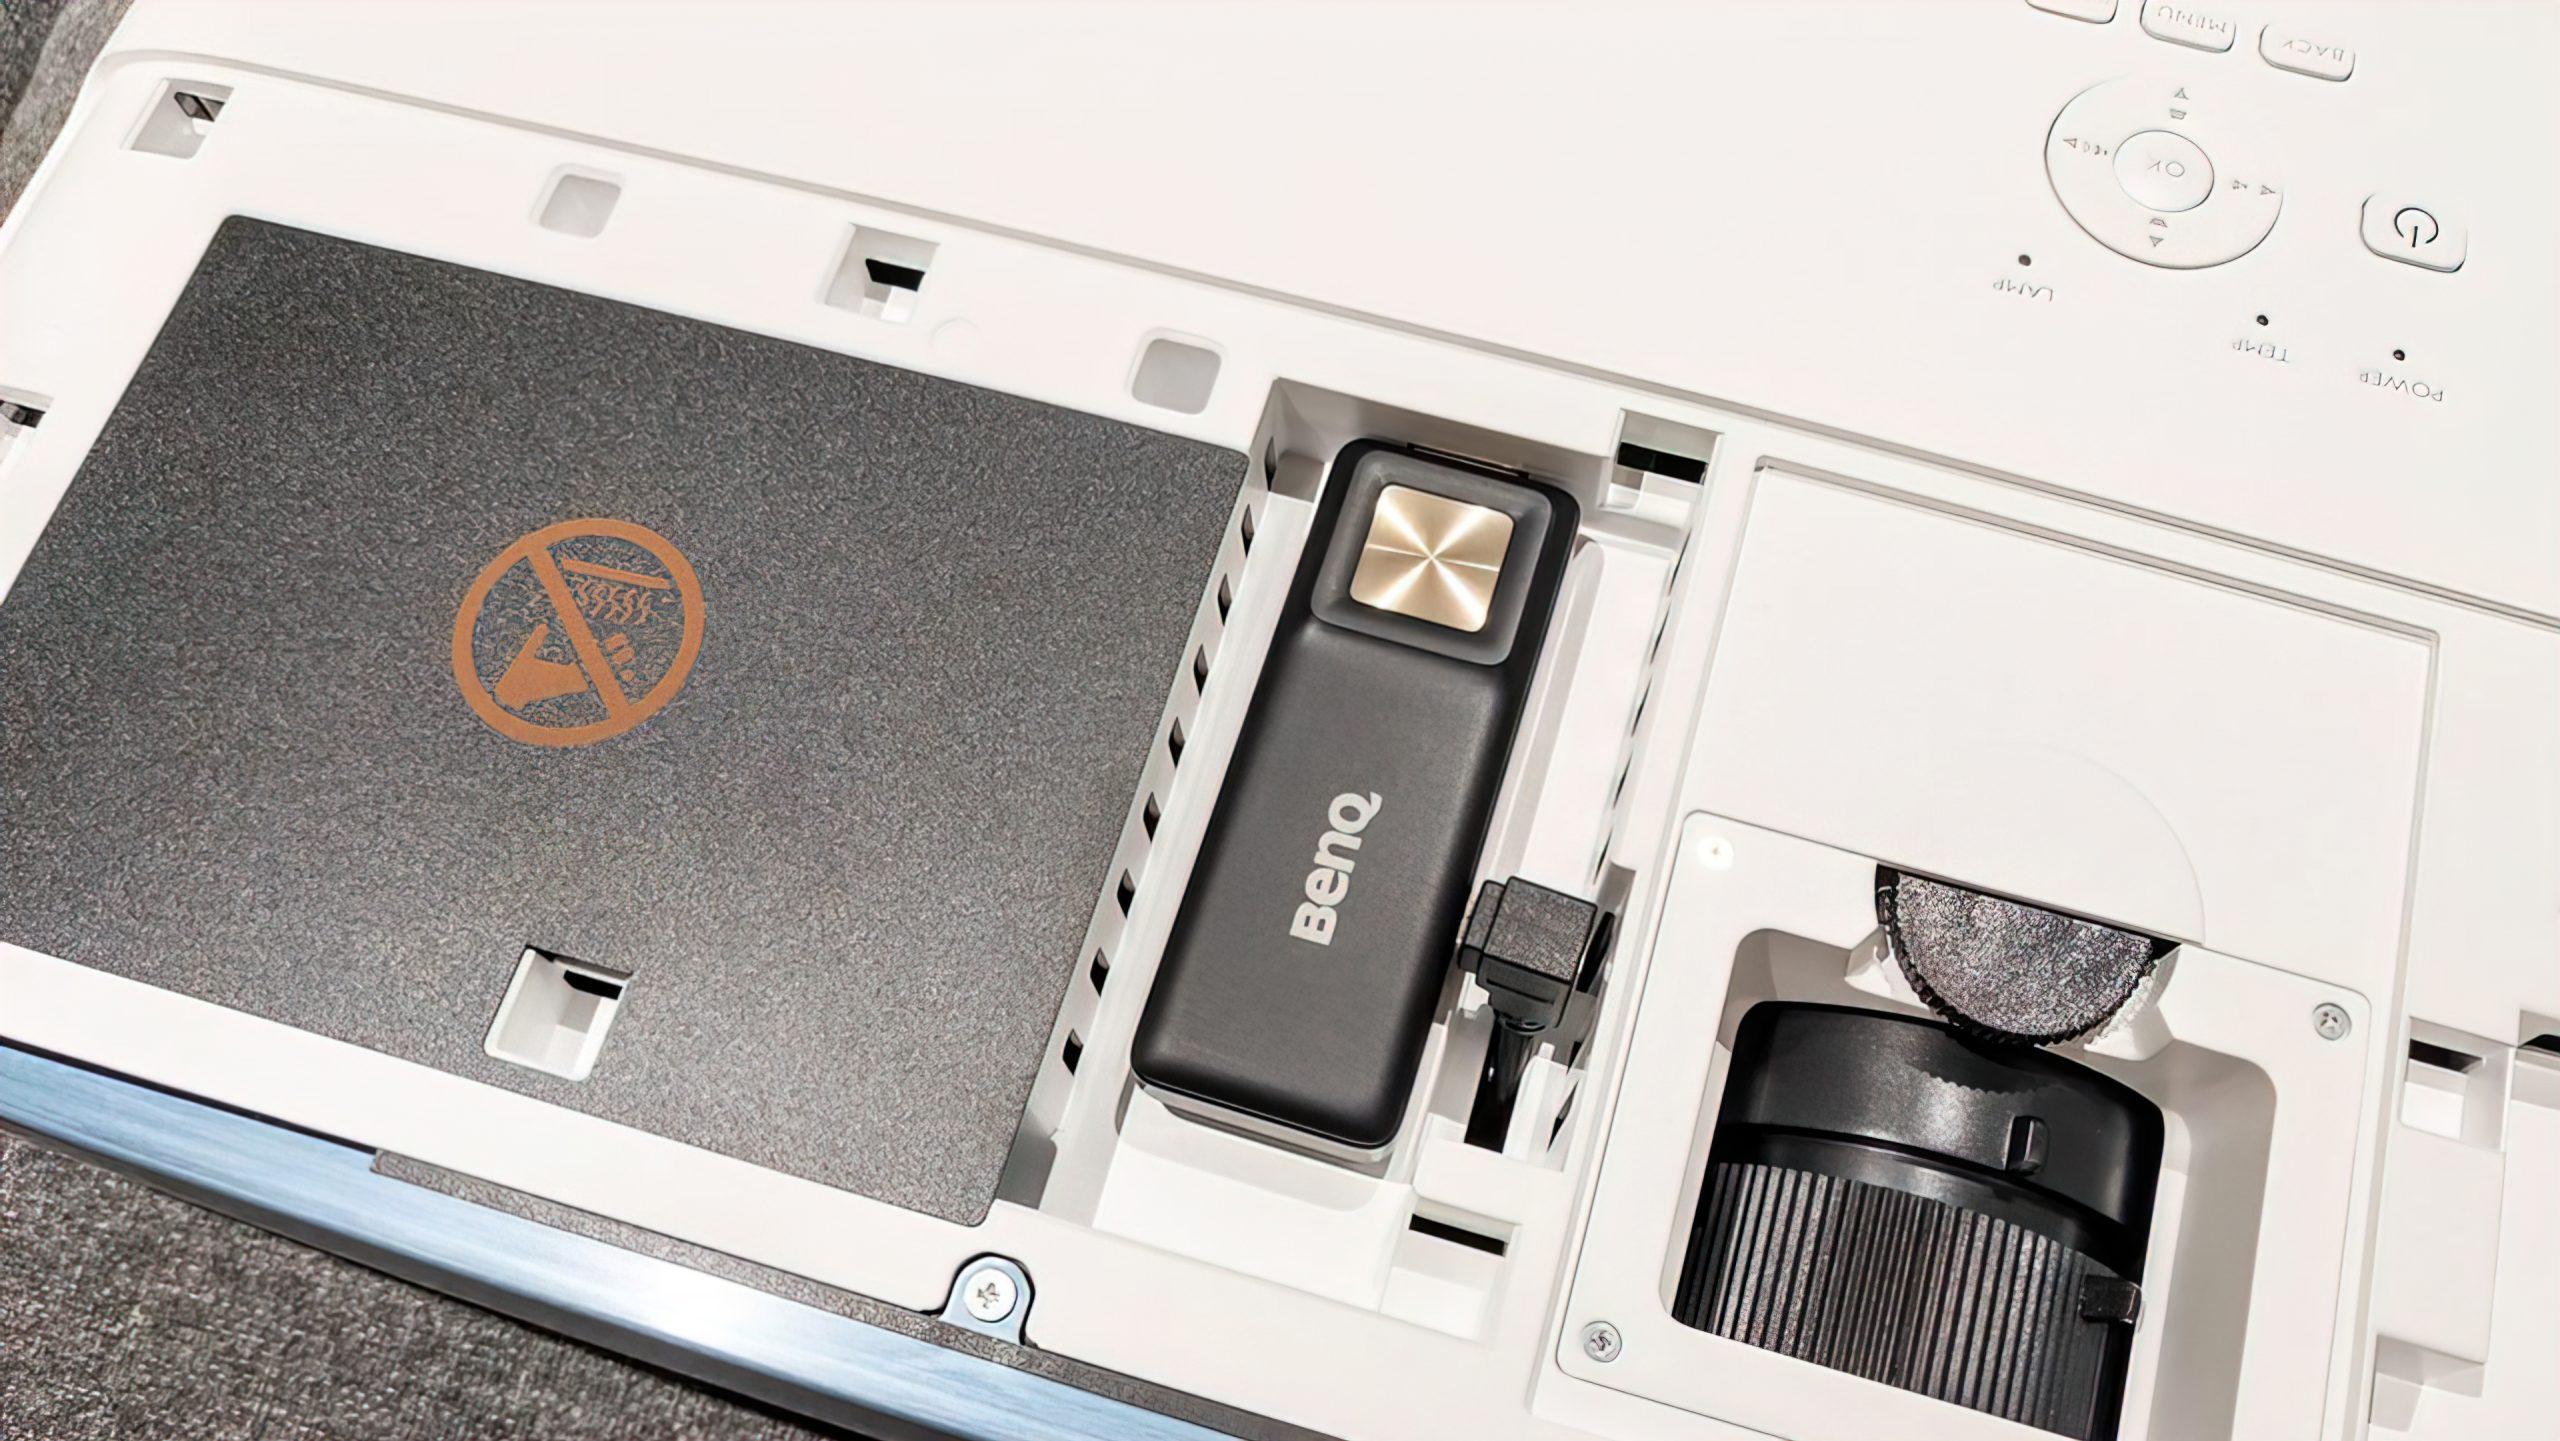 BenQ-TK850i HDMI dongle